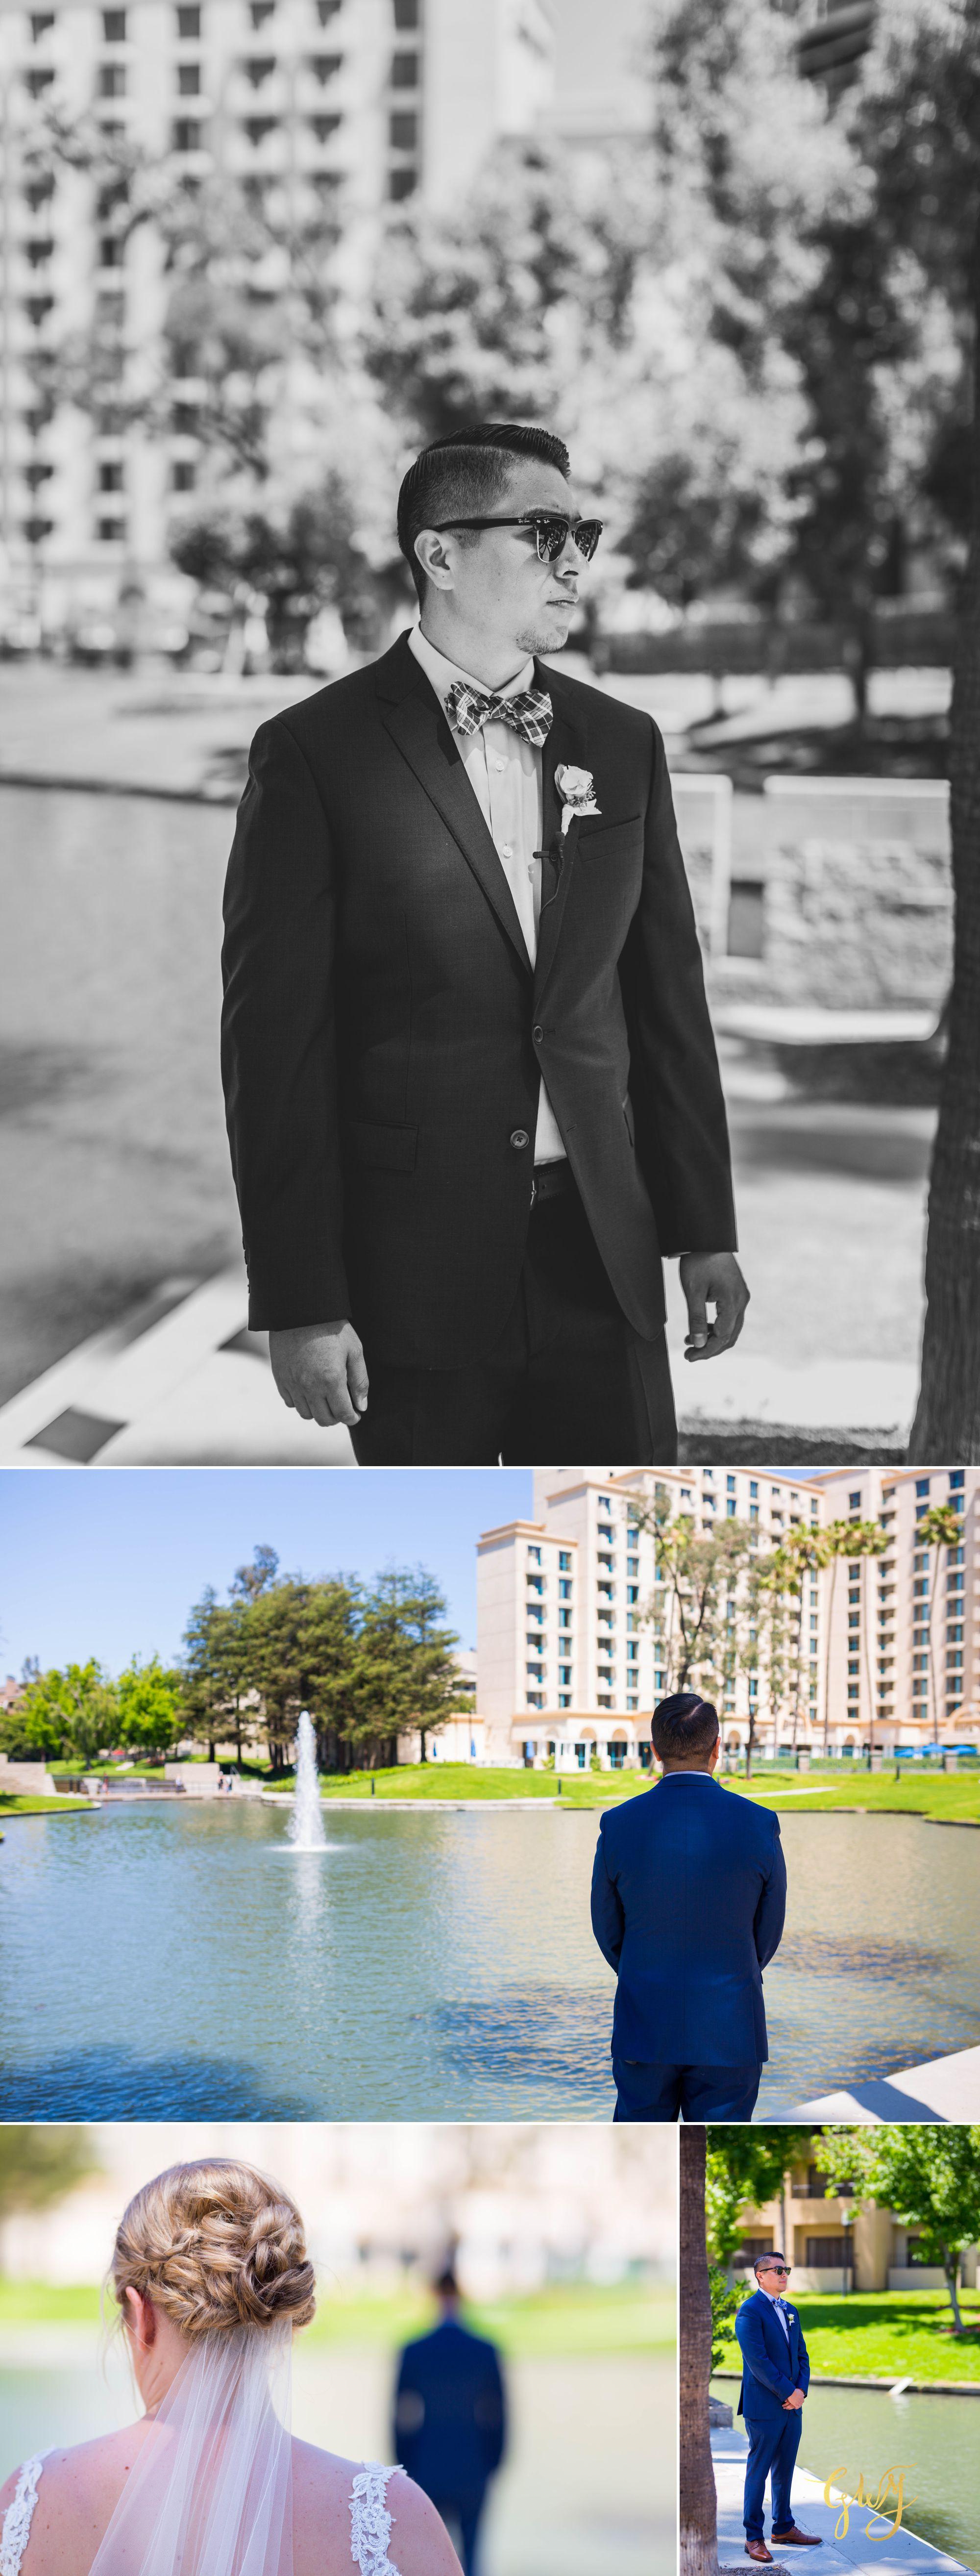 Javier + Kari Avenue of the Arts First Look Vintage Rose Wedding Ceremony Reception by Glass Woods Media 5.jpg